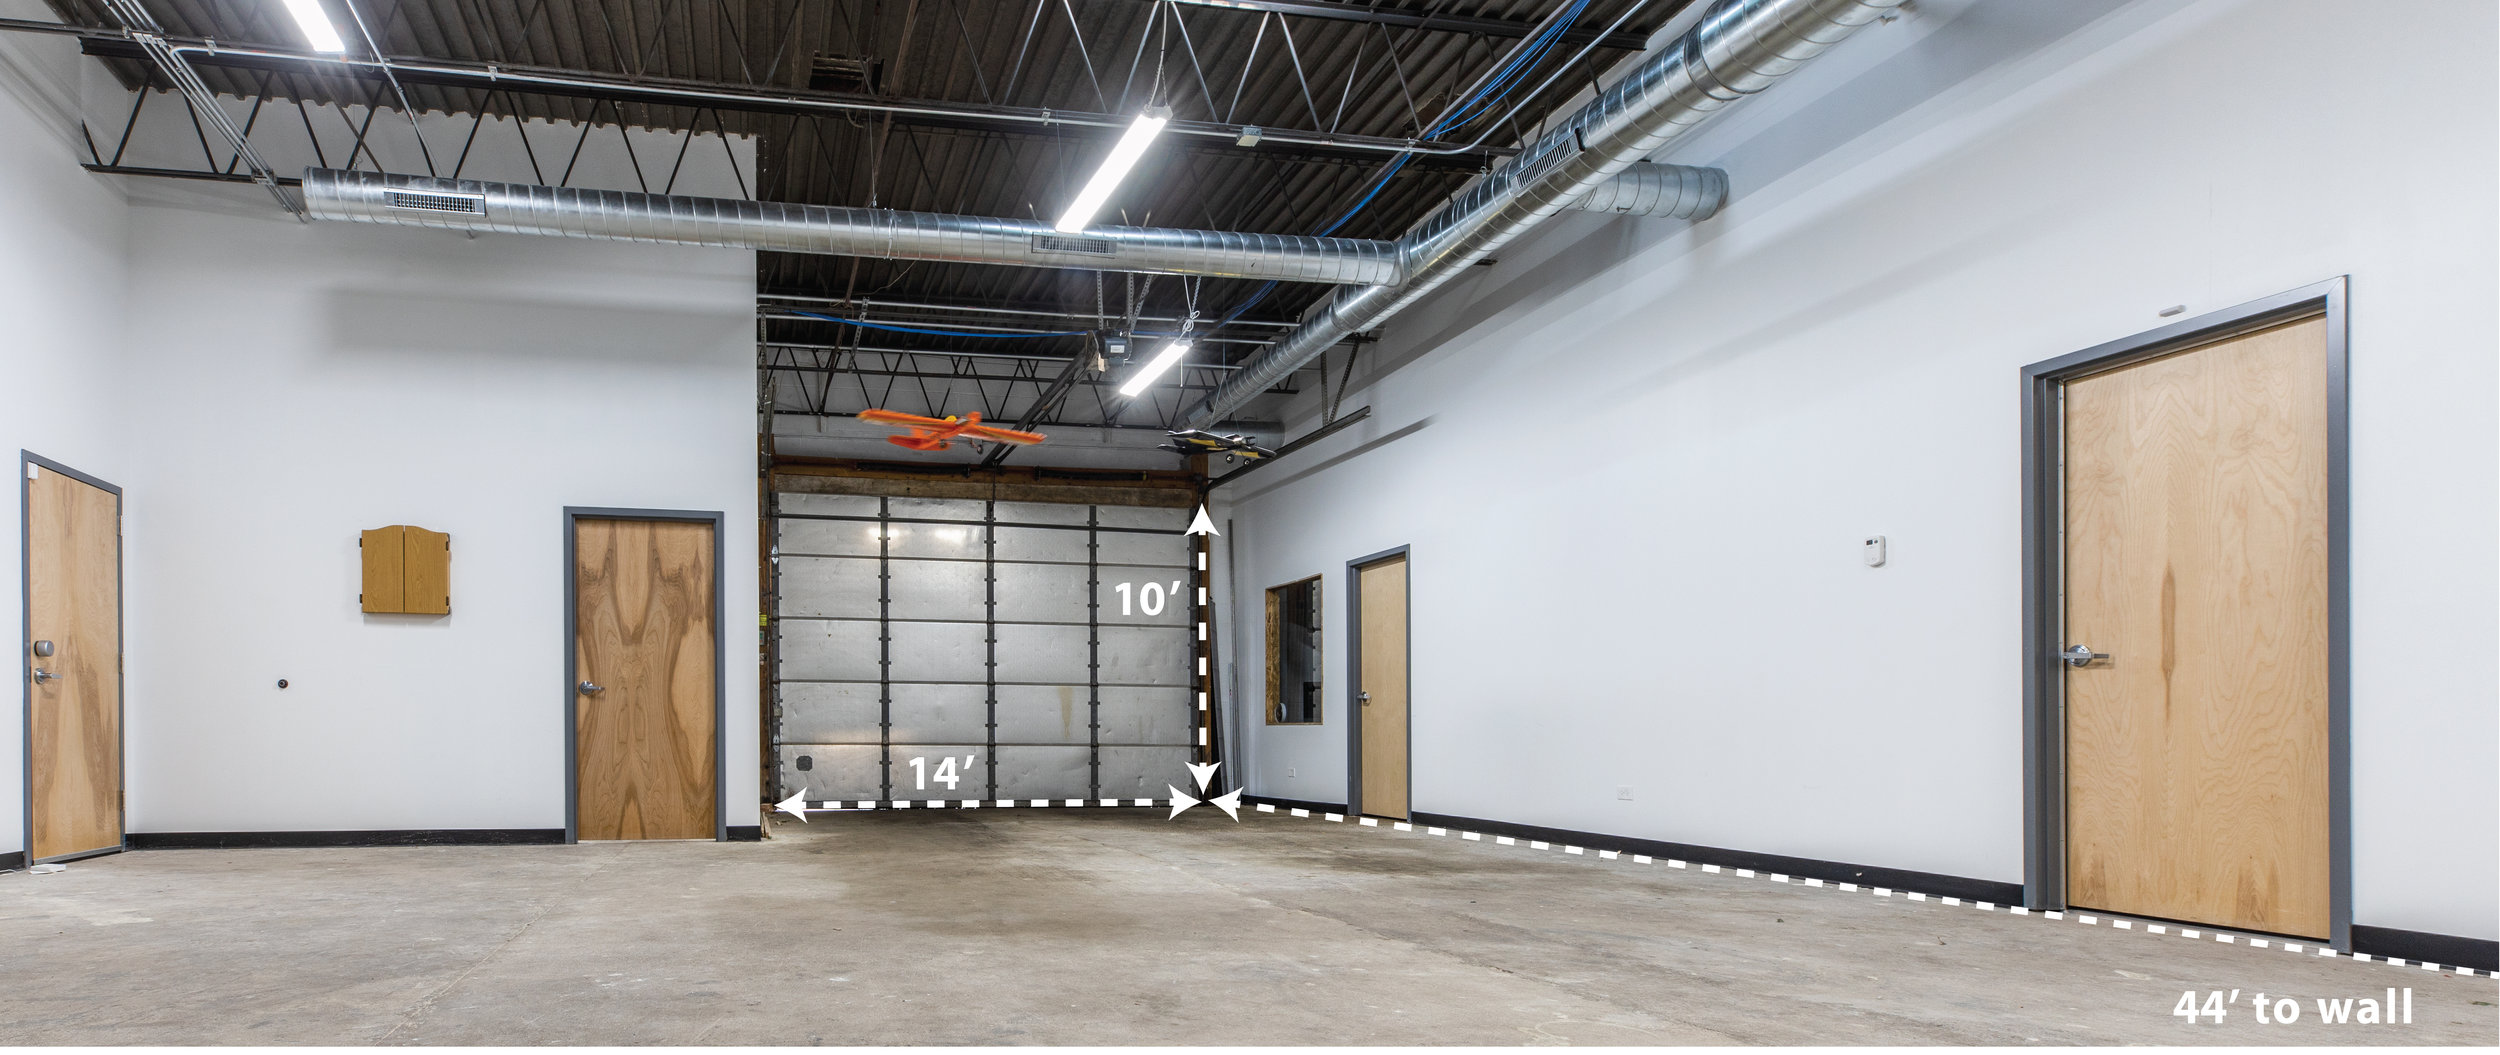 Dimensions-Garage.jpg